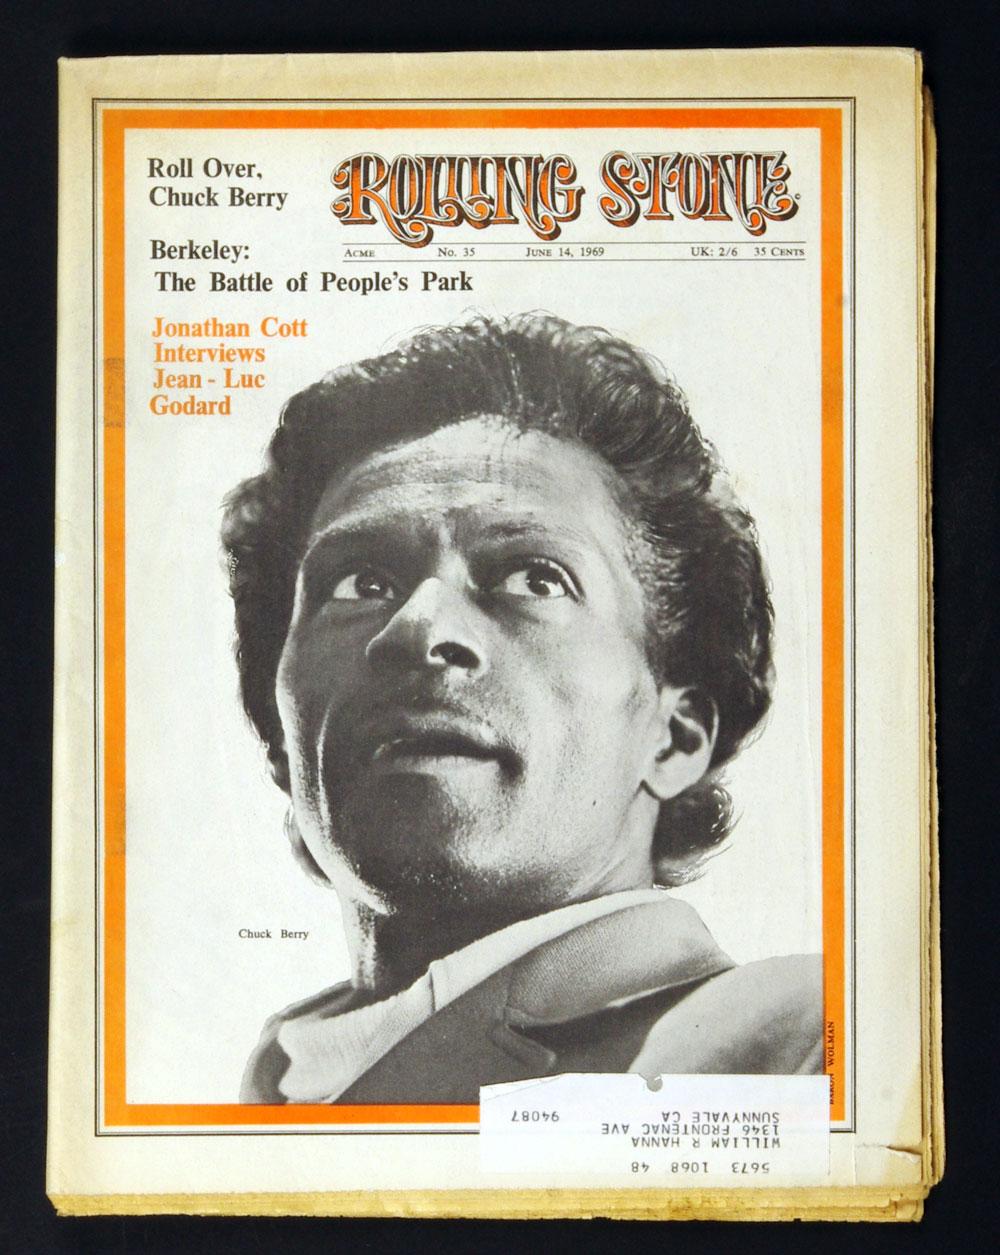 Rolling Stone Magazine 1969 Jun 14 No. 35 Chuck Berry